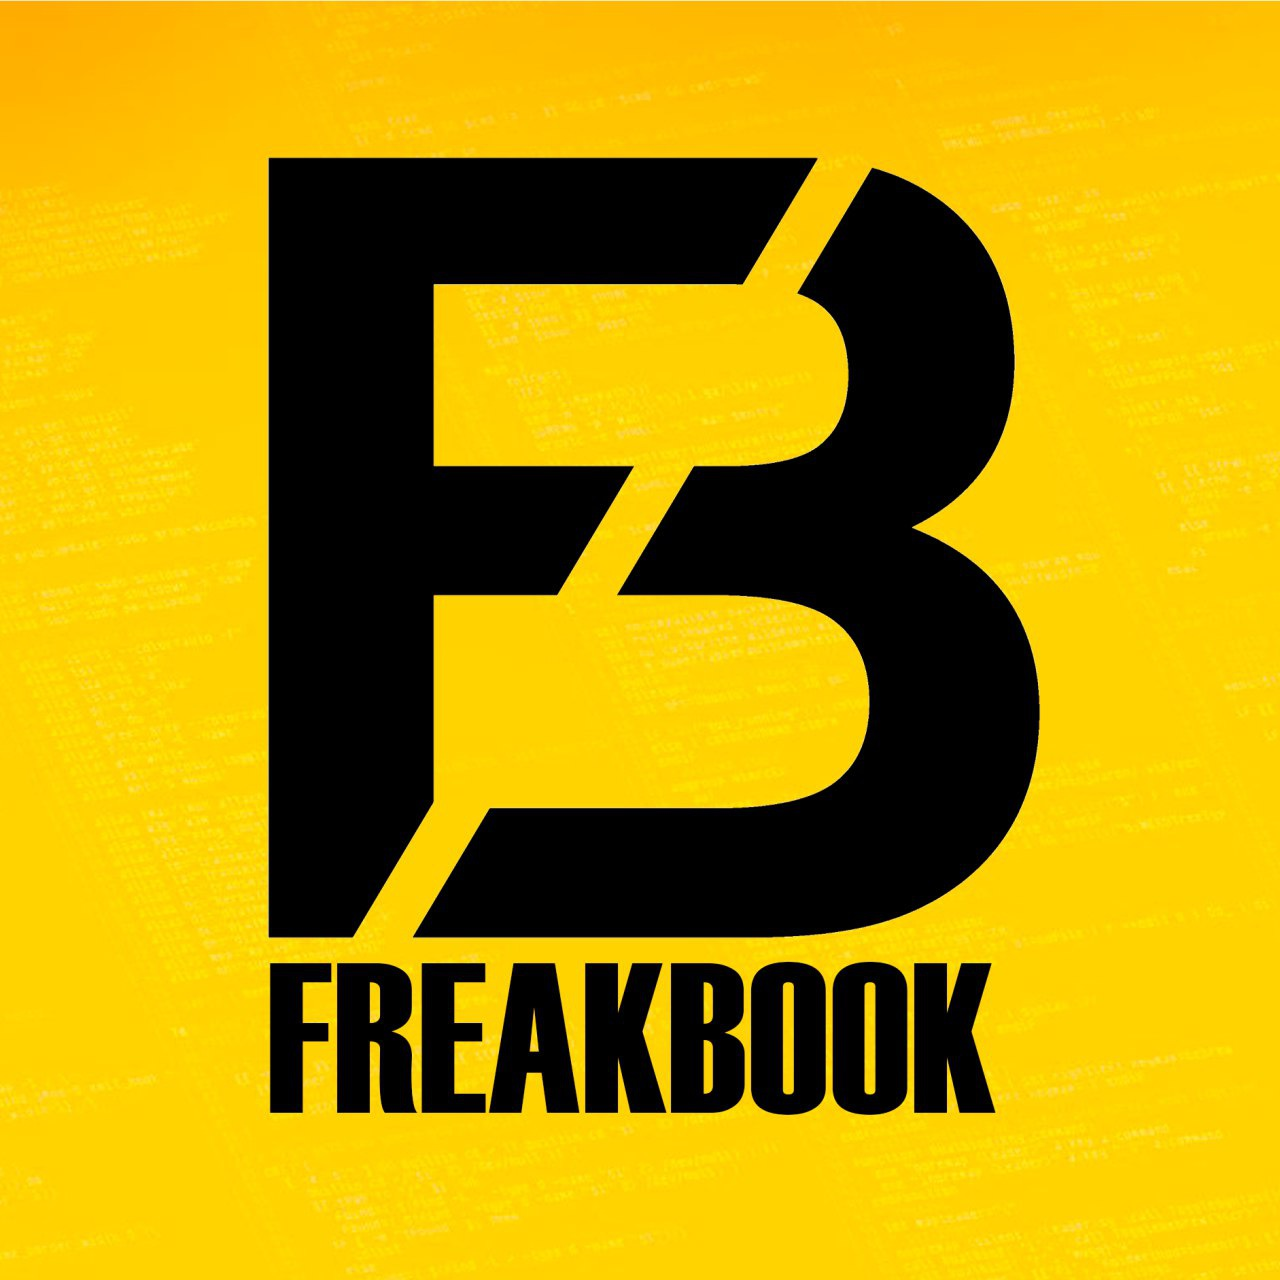 Freakbook Freakbook Telegram Analytics